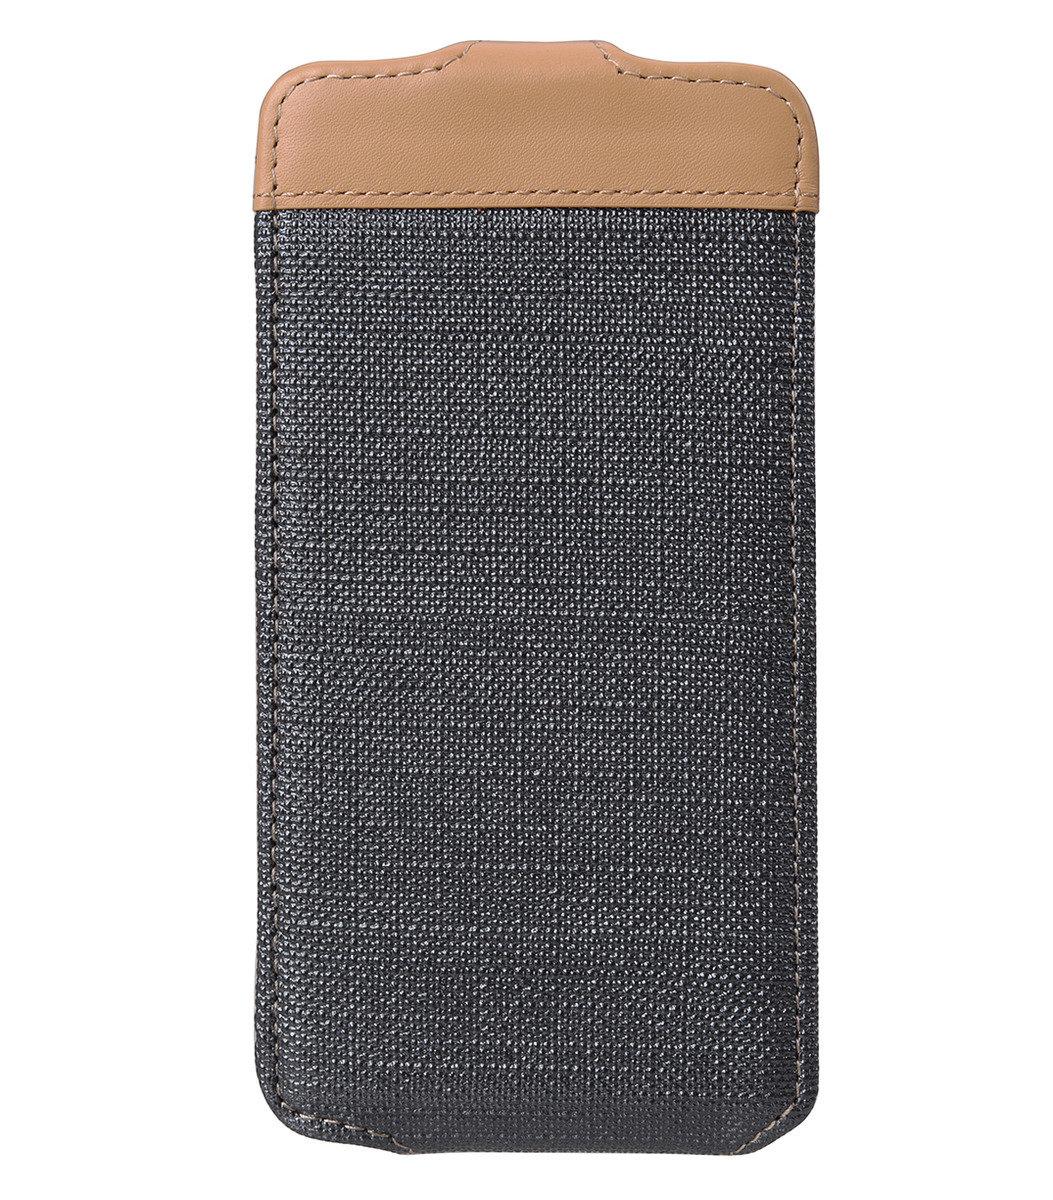 "iPhone 6 Plus/6S Plus (5.5"") Sampu系列 直揭式高級皮革手機套 - 灰色"